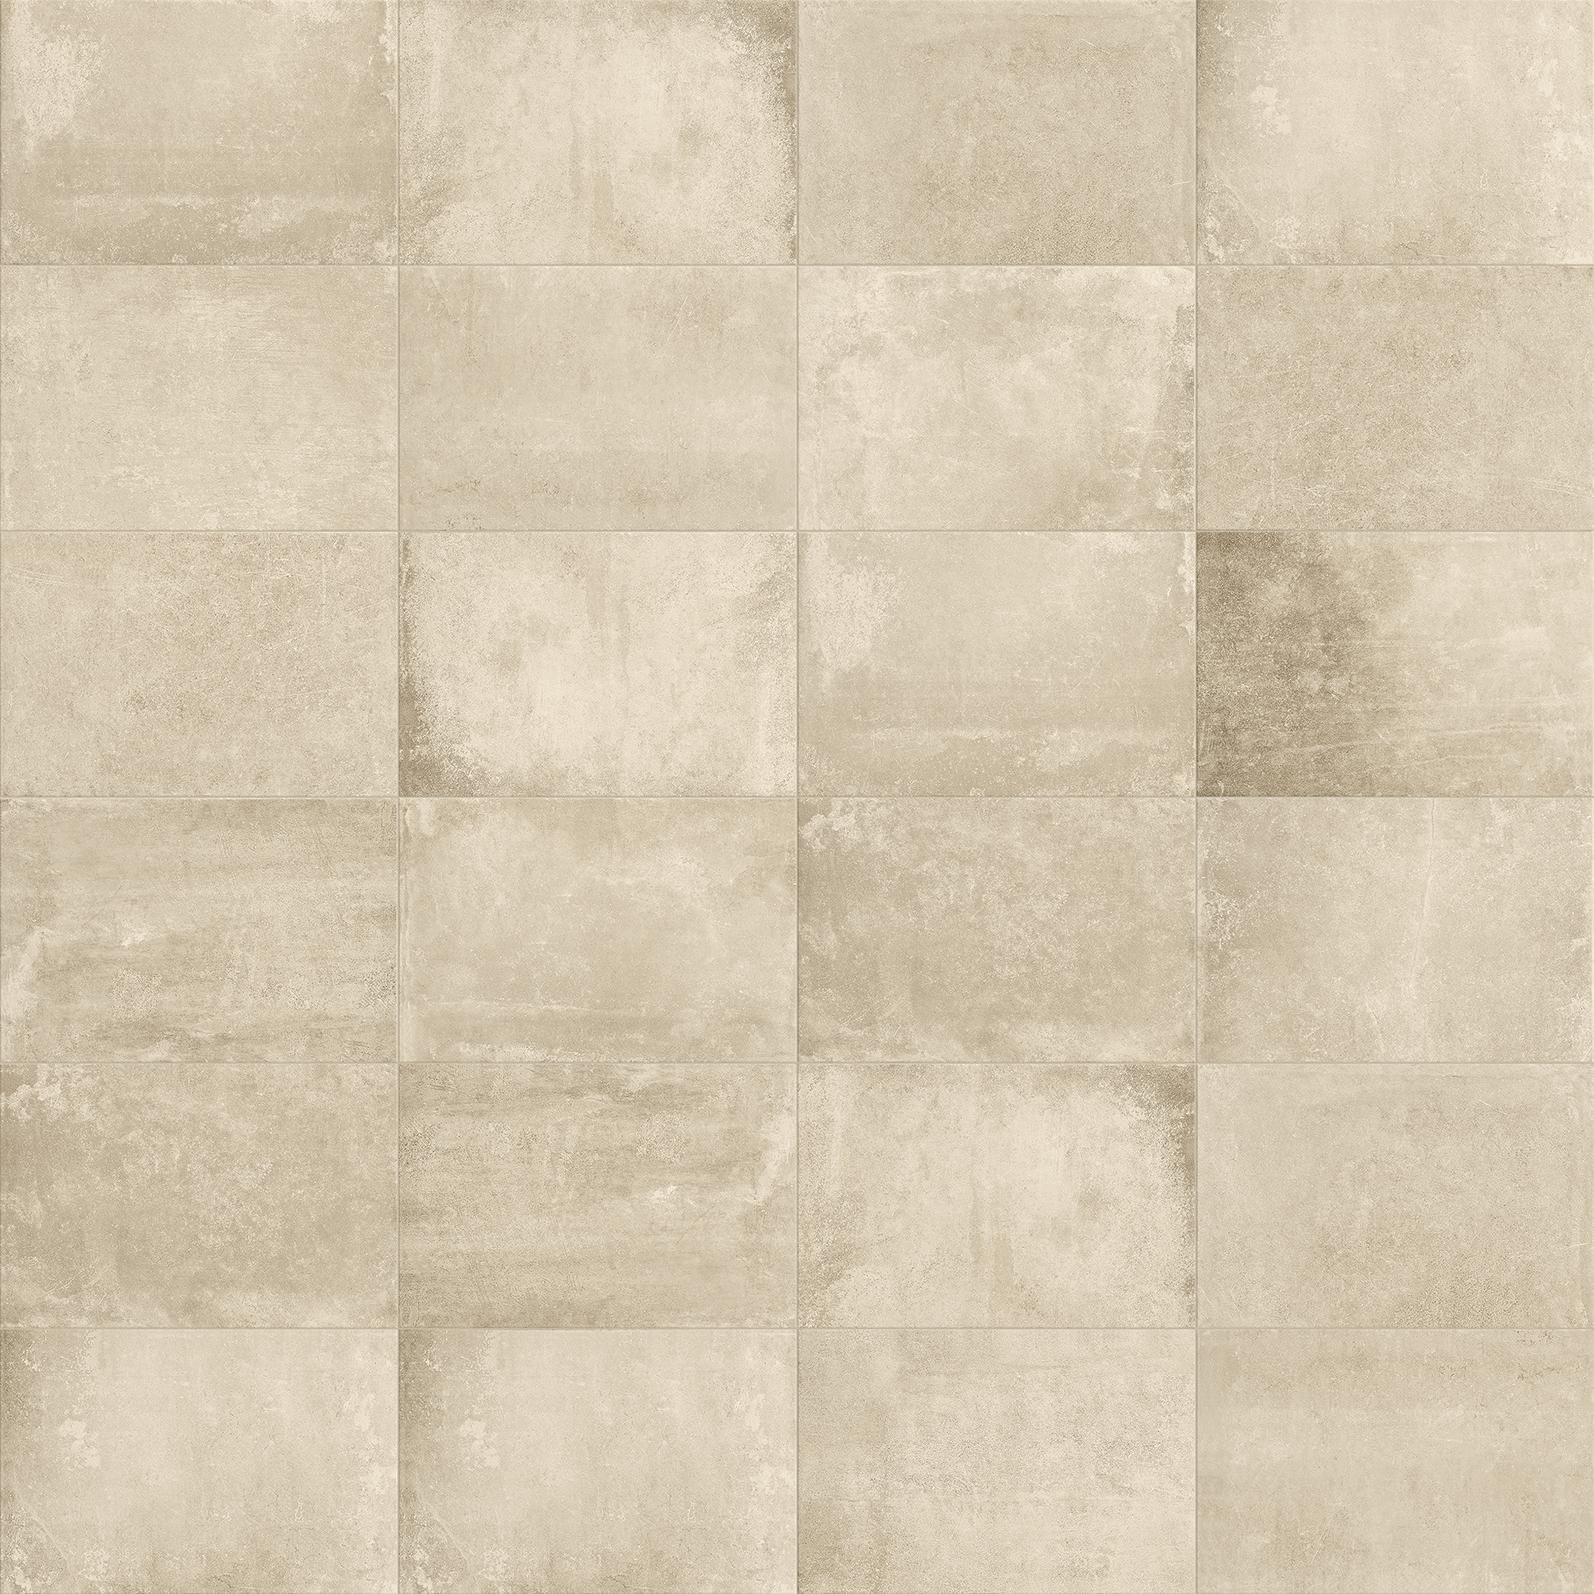 opus stone beige rustic stone effect porcelain tile studio tiles